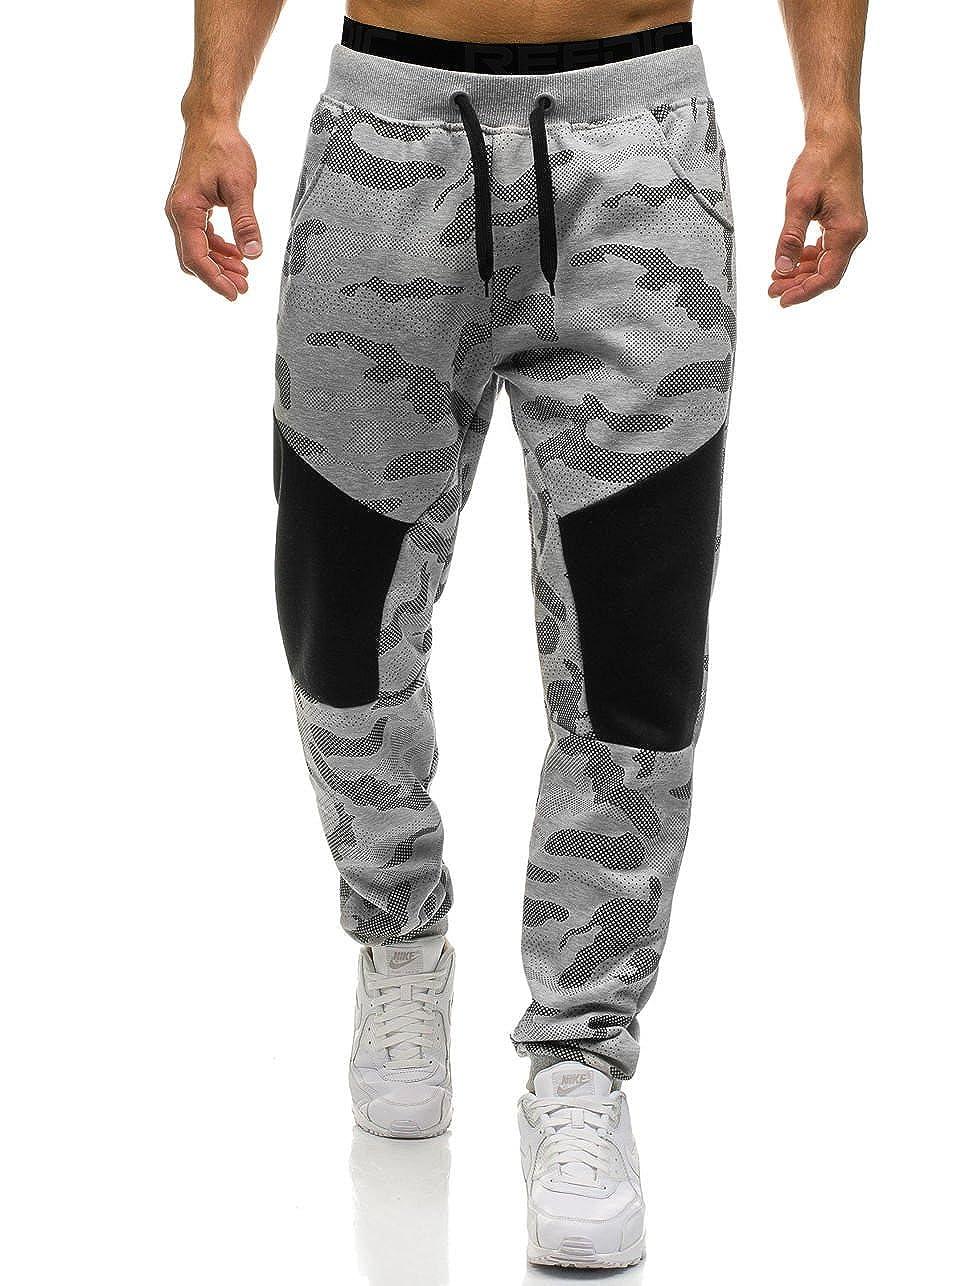 fef9c1b338ace3 Amazon.com: Ouber Men's Slim Fit Camo Jogger Sweatpant Cotton Tapered Gym  Pants: Clothing